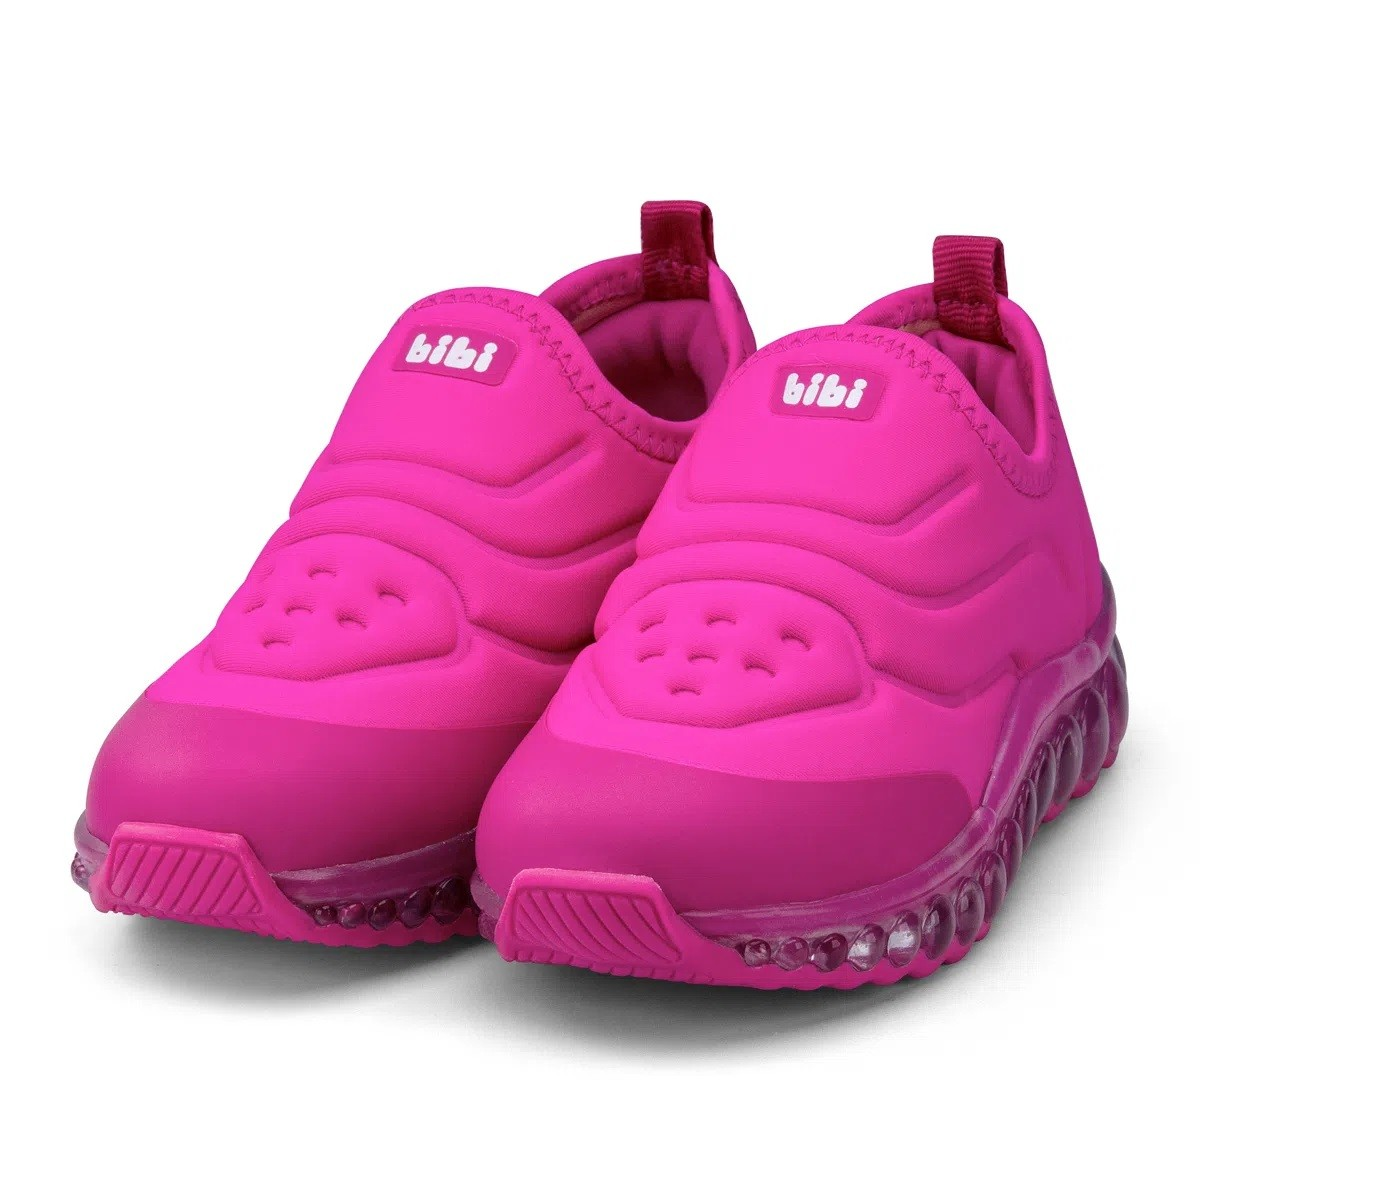 Tênis Infantil Bibi Celebration Rosa Pink